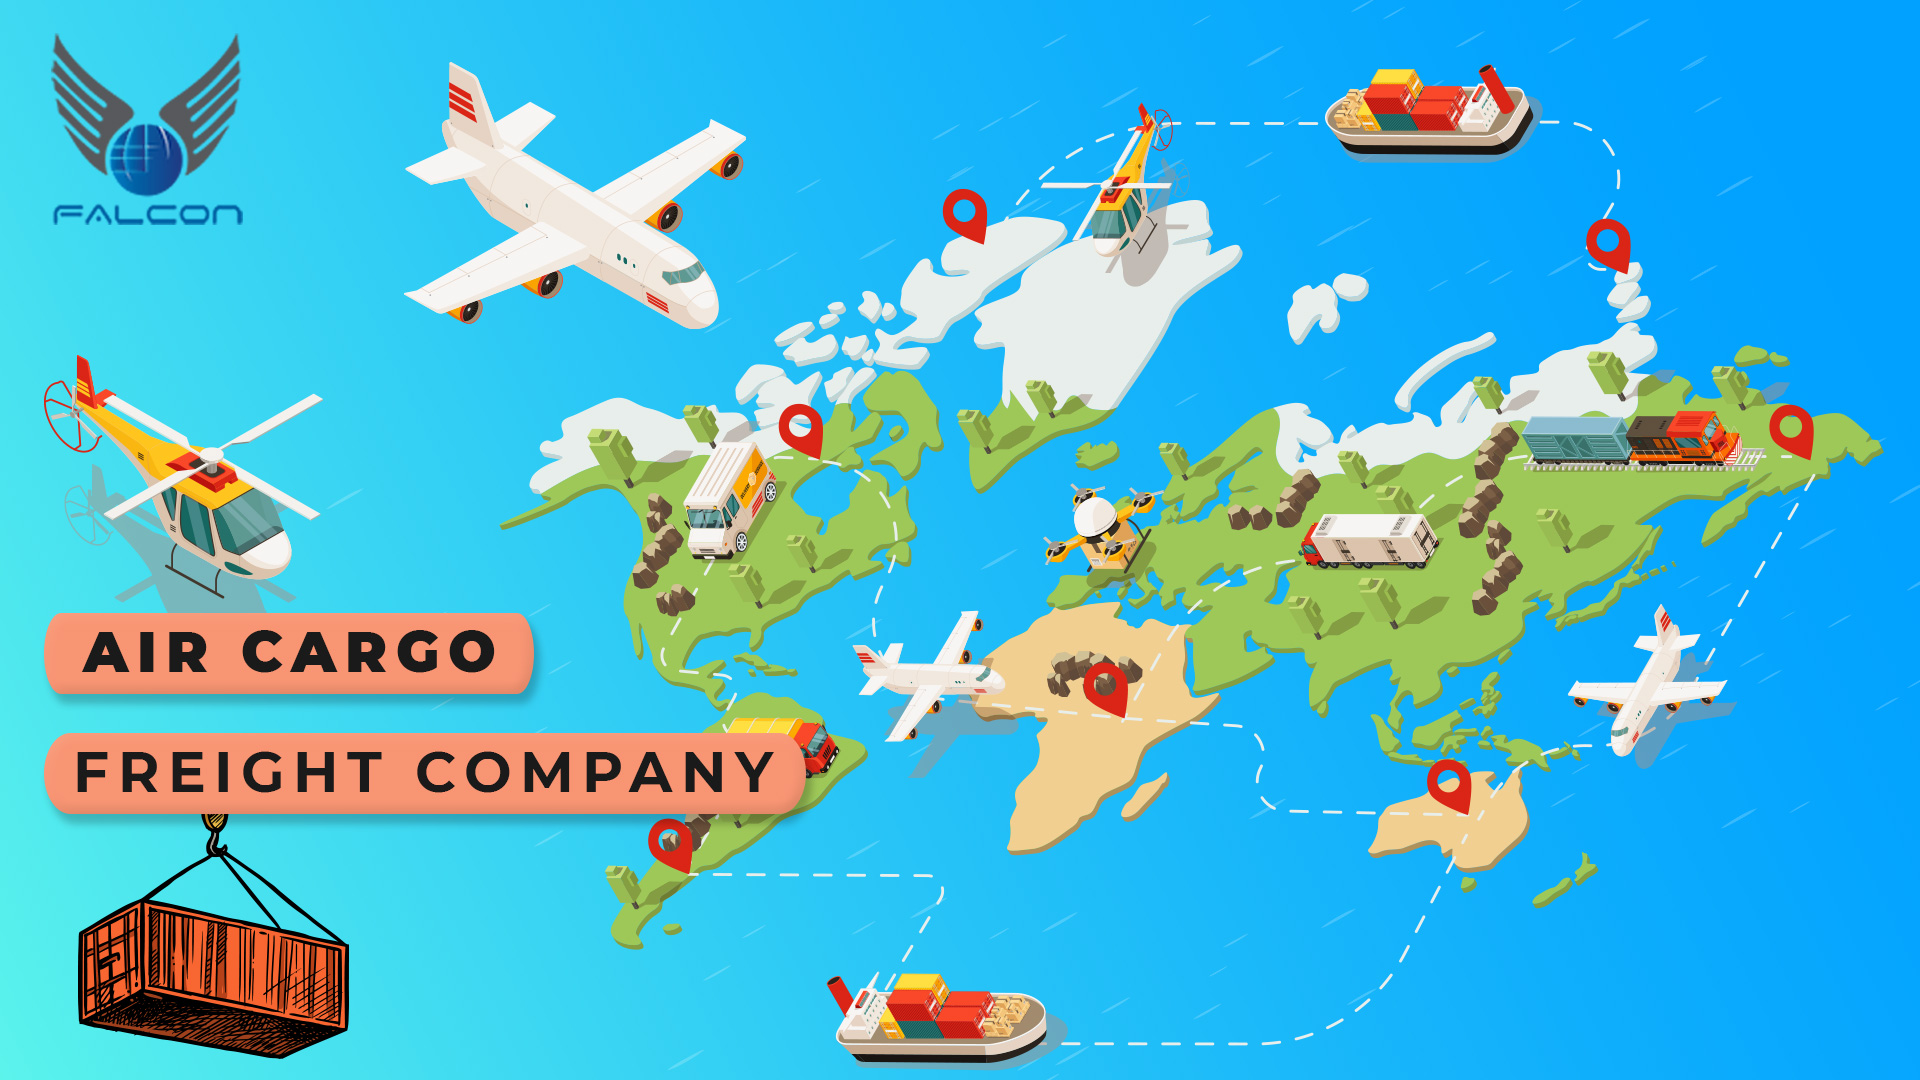 Air Cargo Freight Company